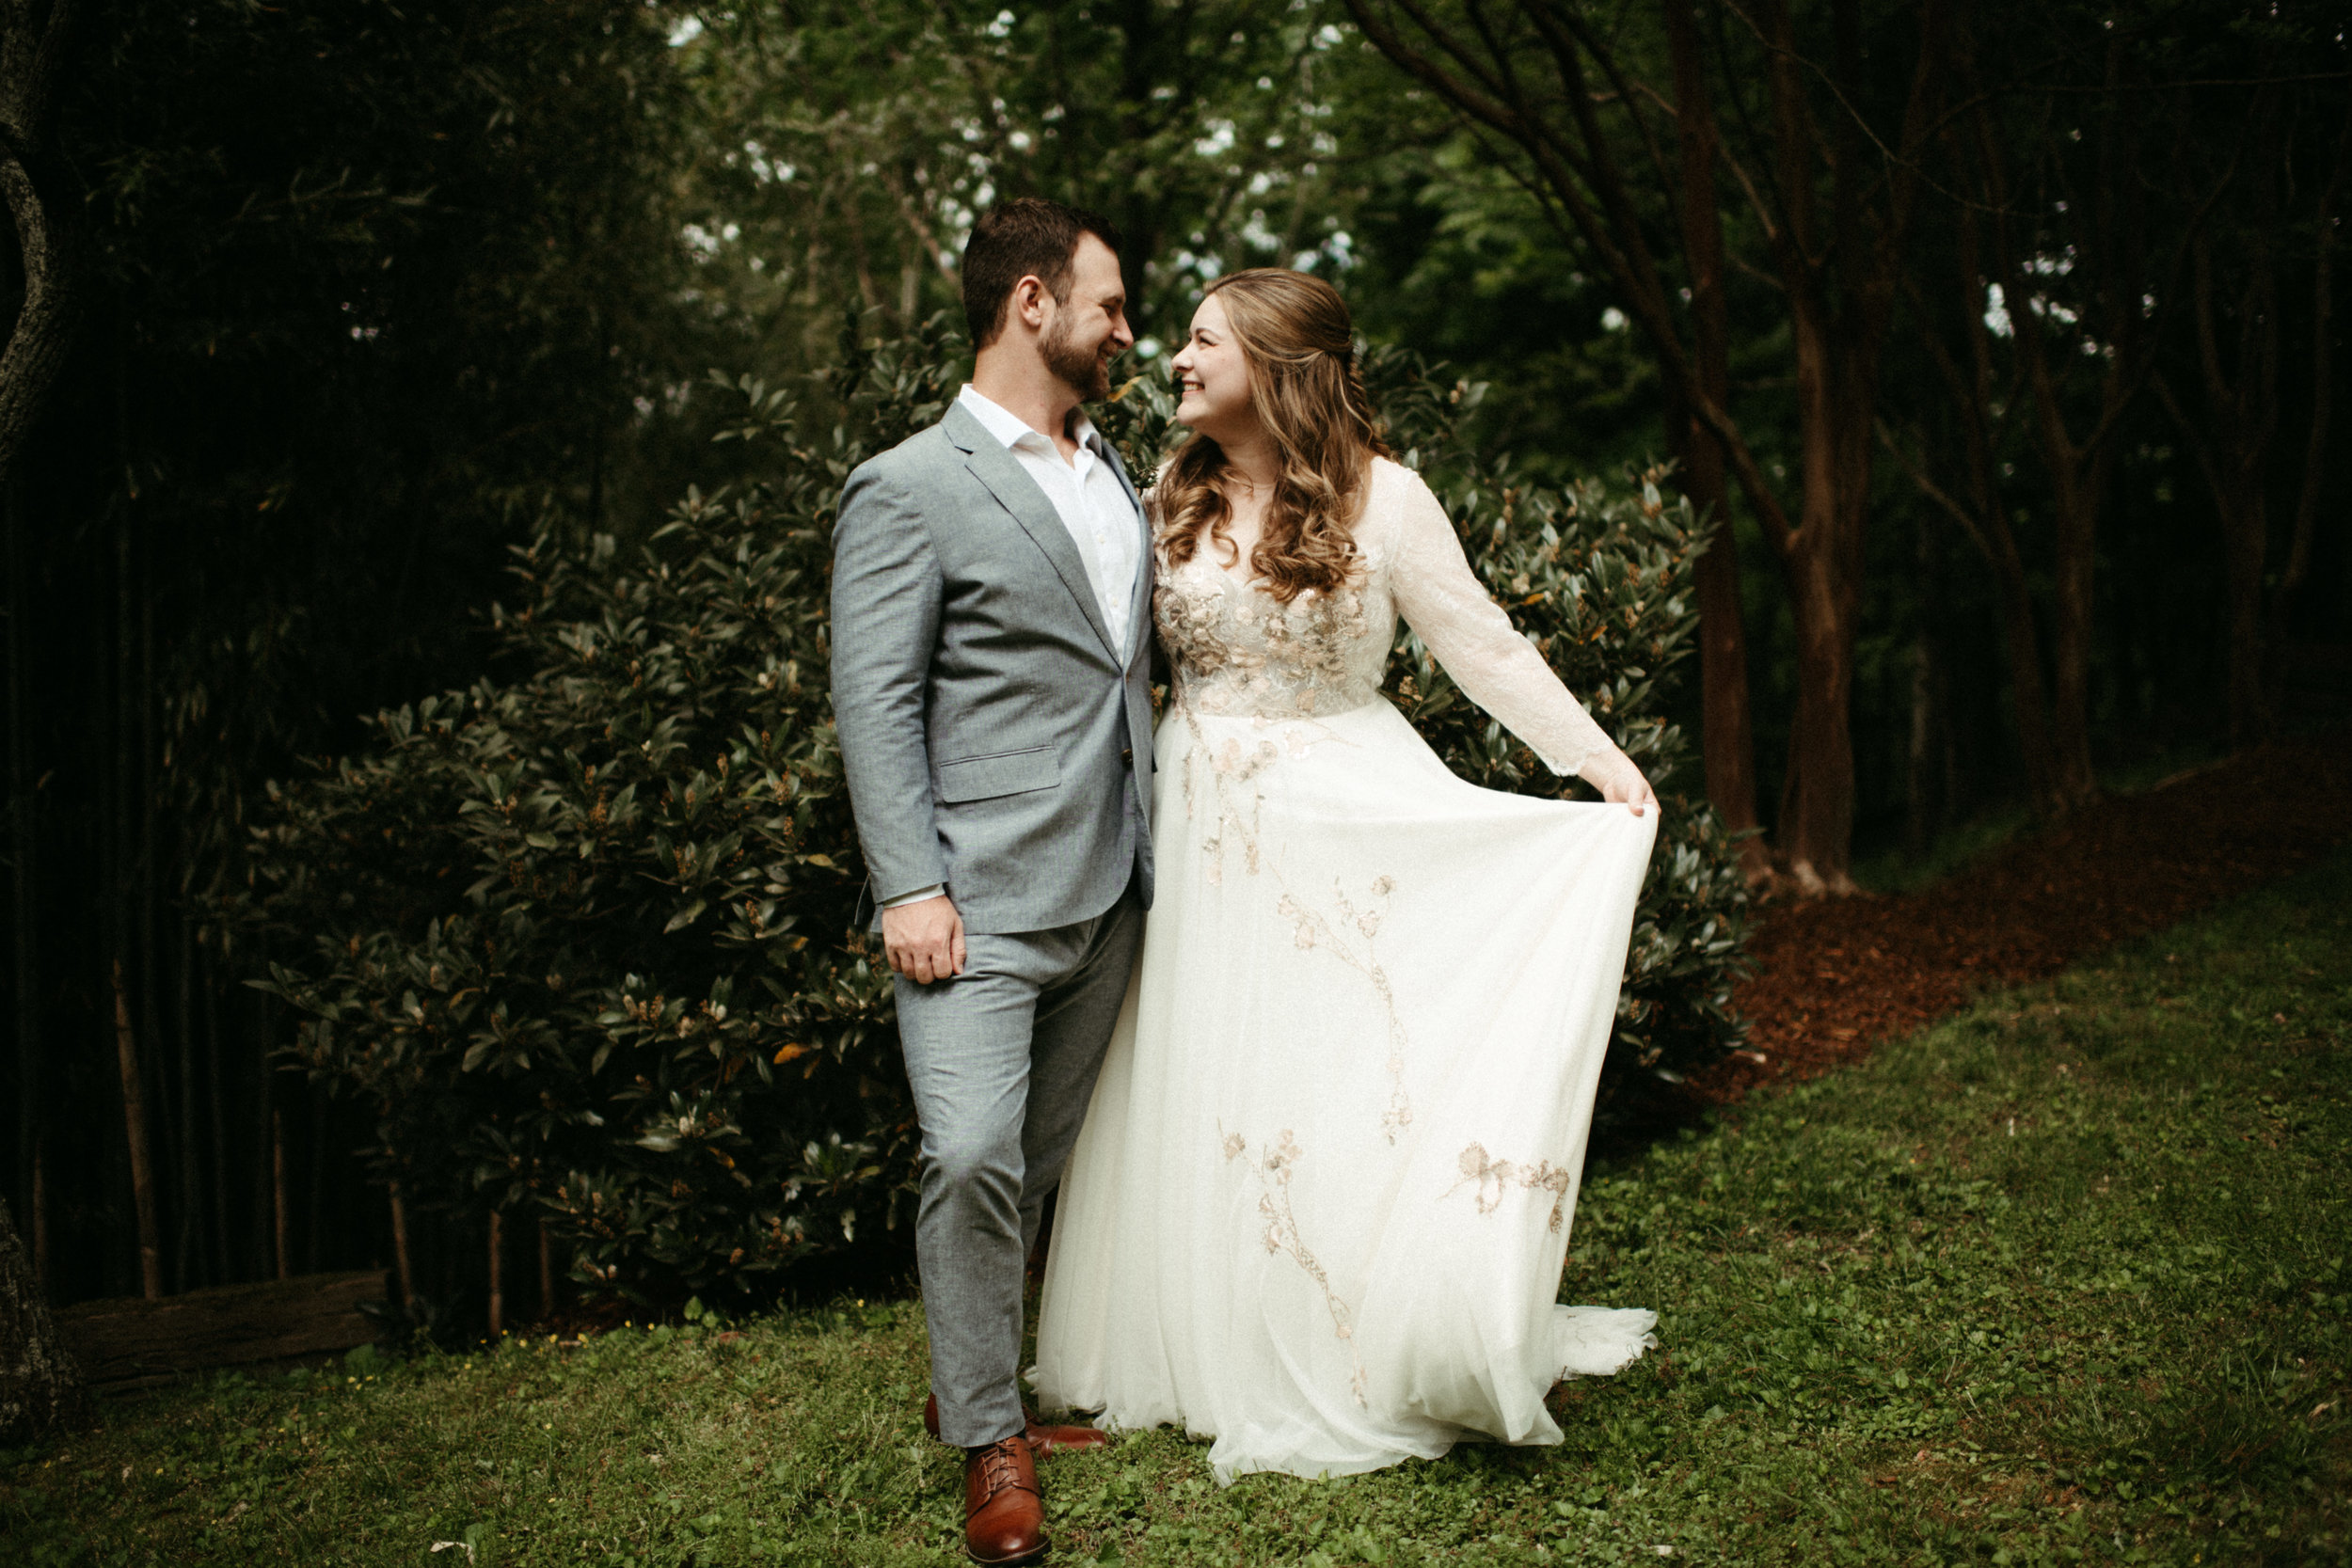 Elizabeth and Aldens Intimate Backyard wedding in Nashville Tennessee Wedding Photographer00003.jpg